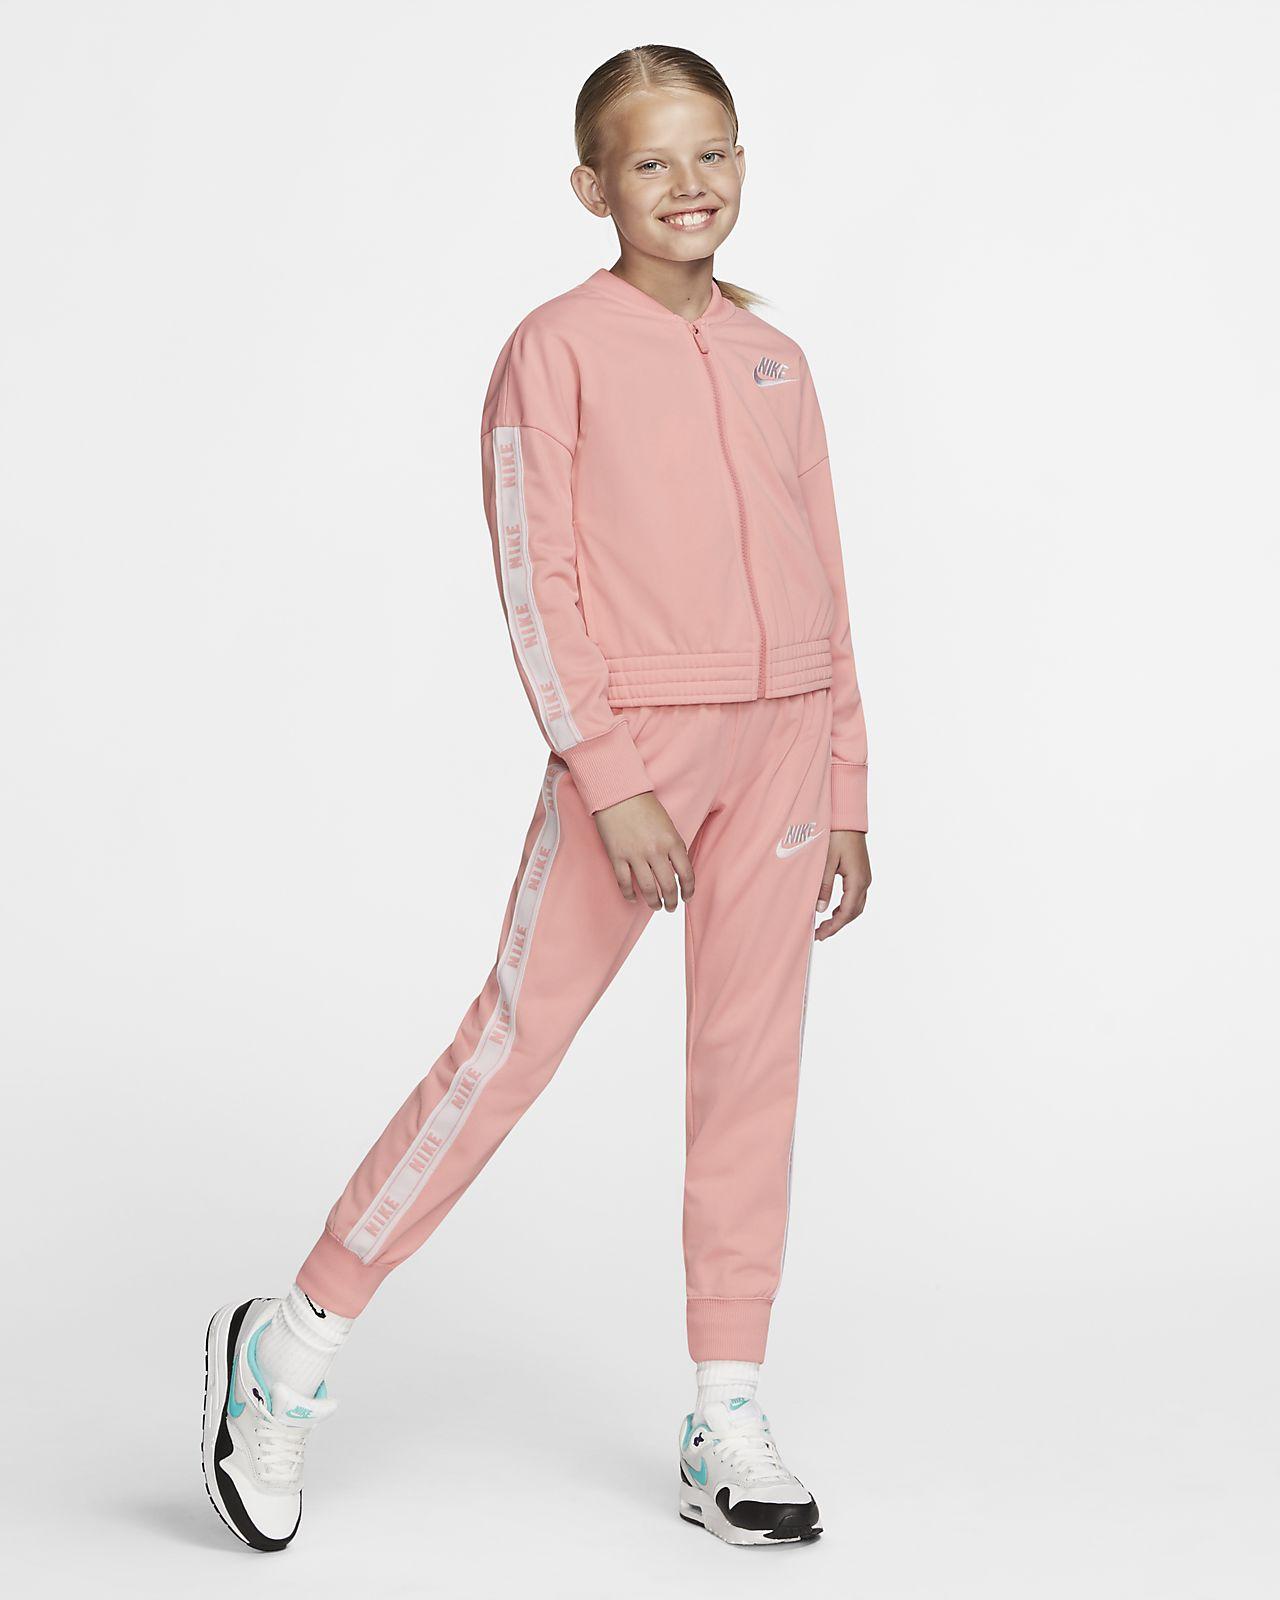 Nike Sportswear 大童(女孩)运动套装